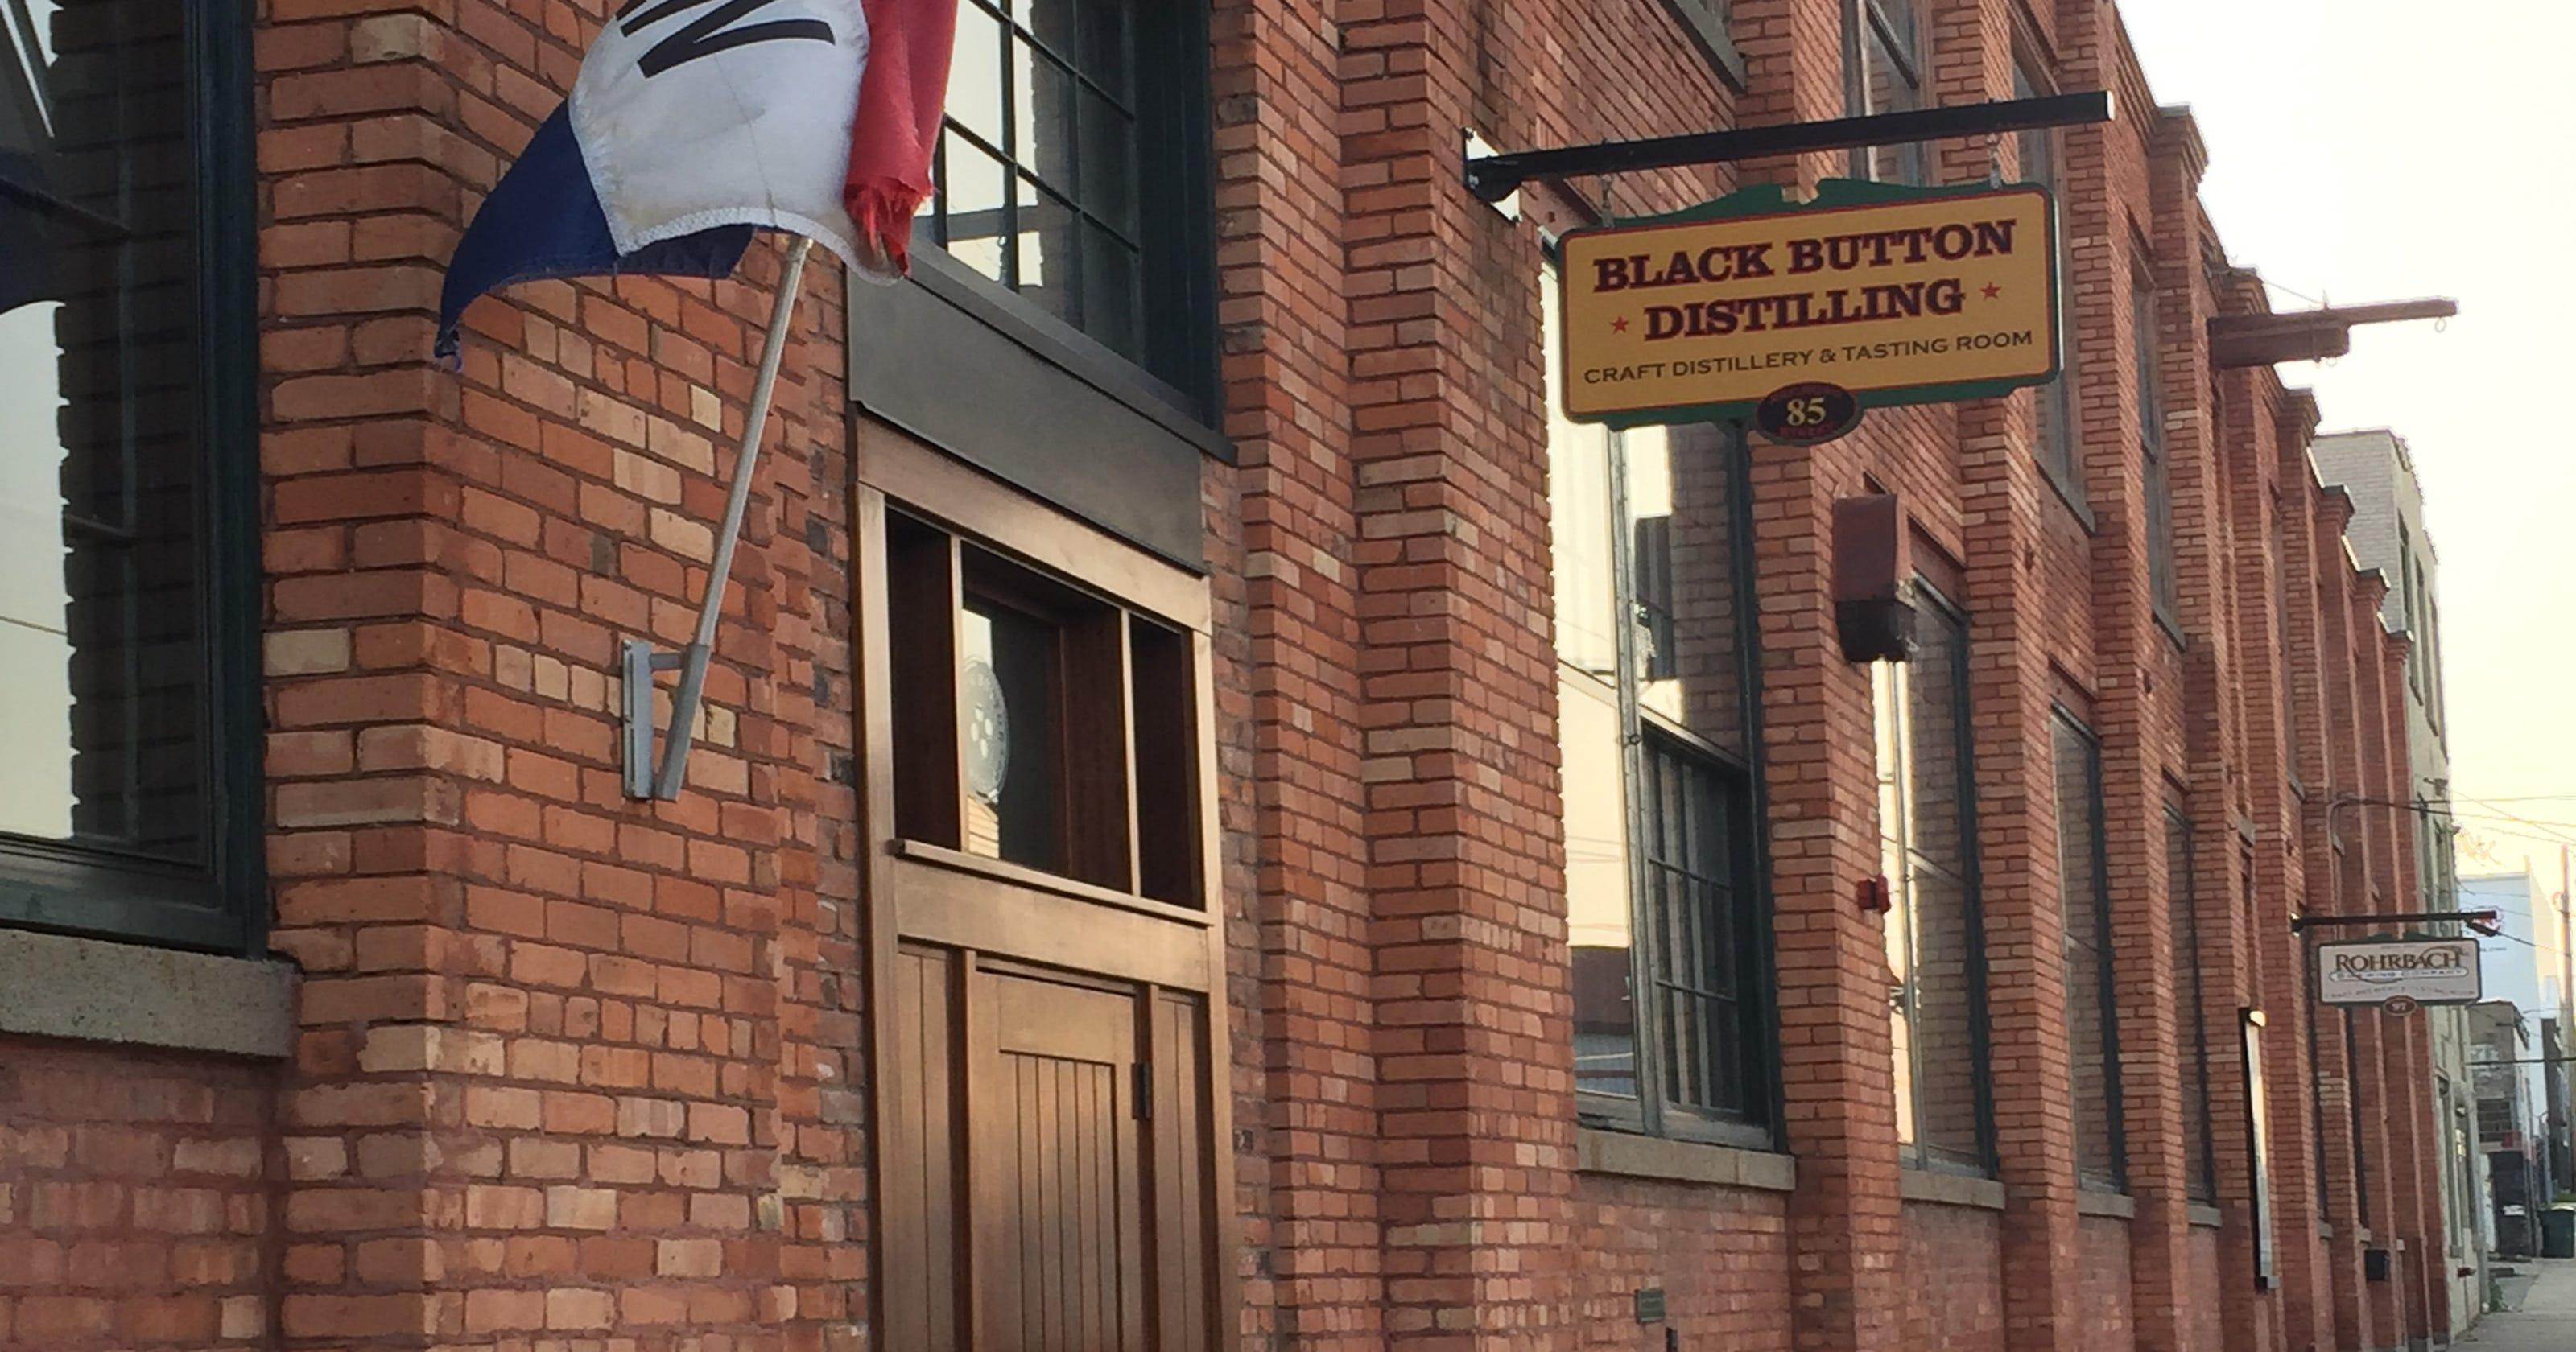 Black Button trains future distillers